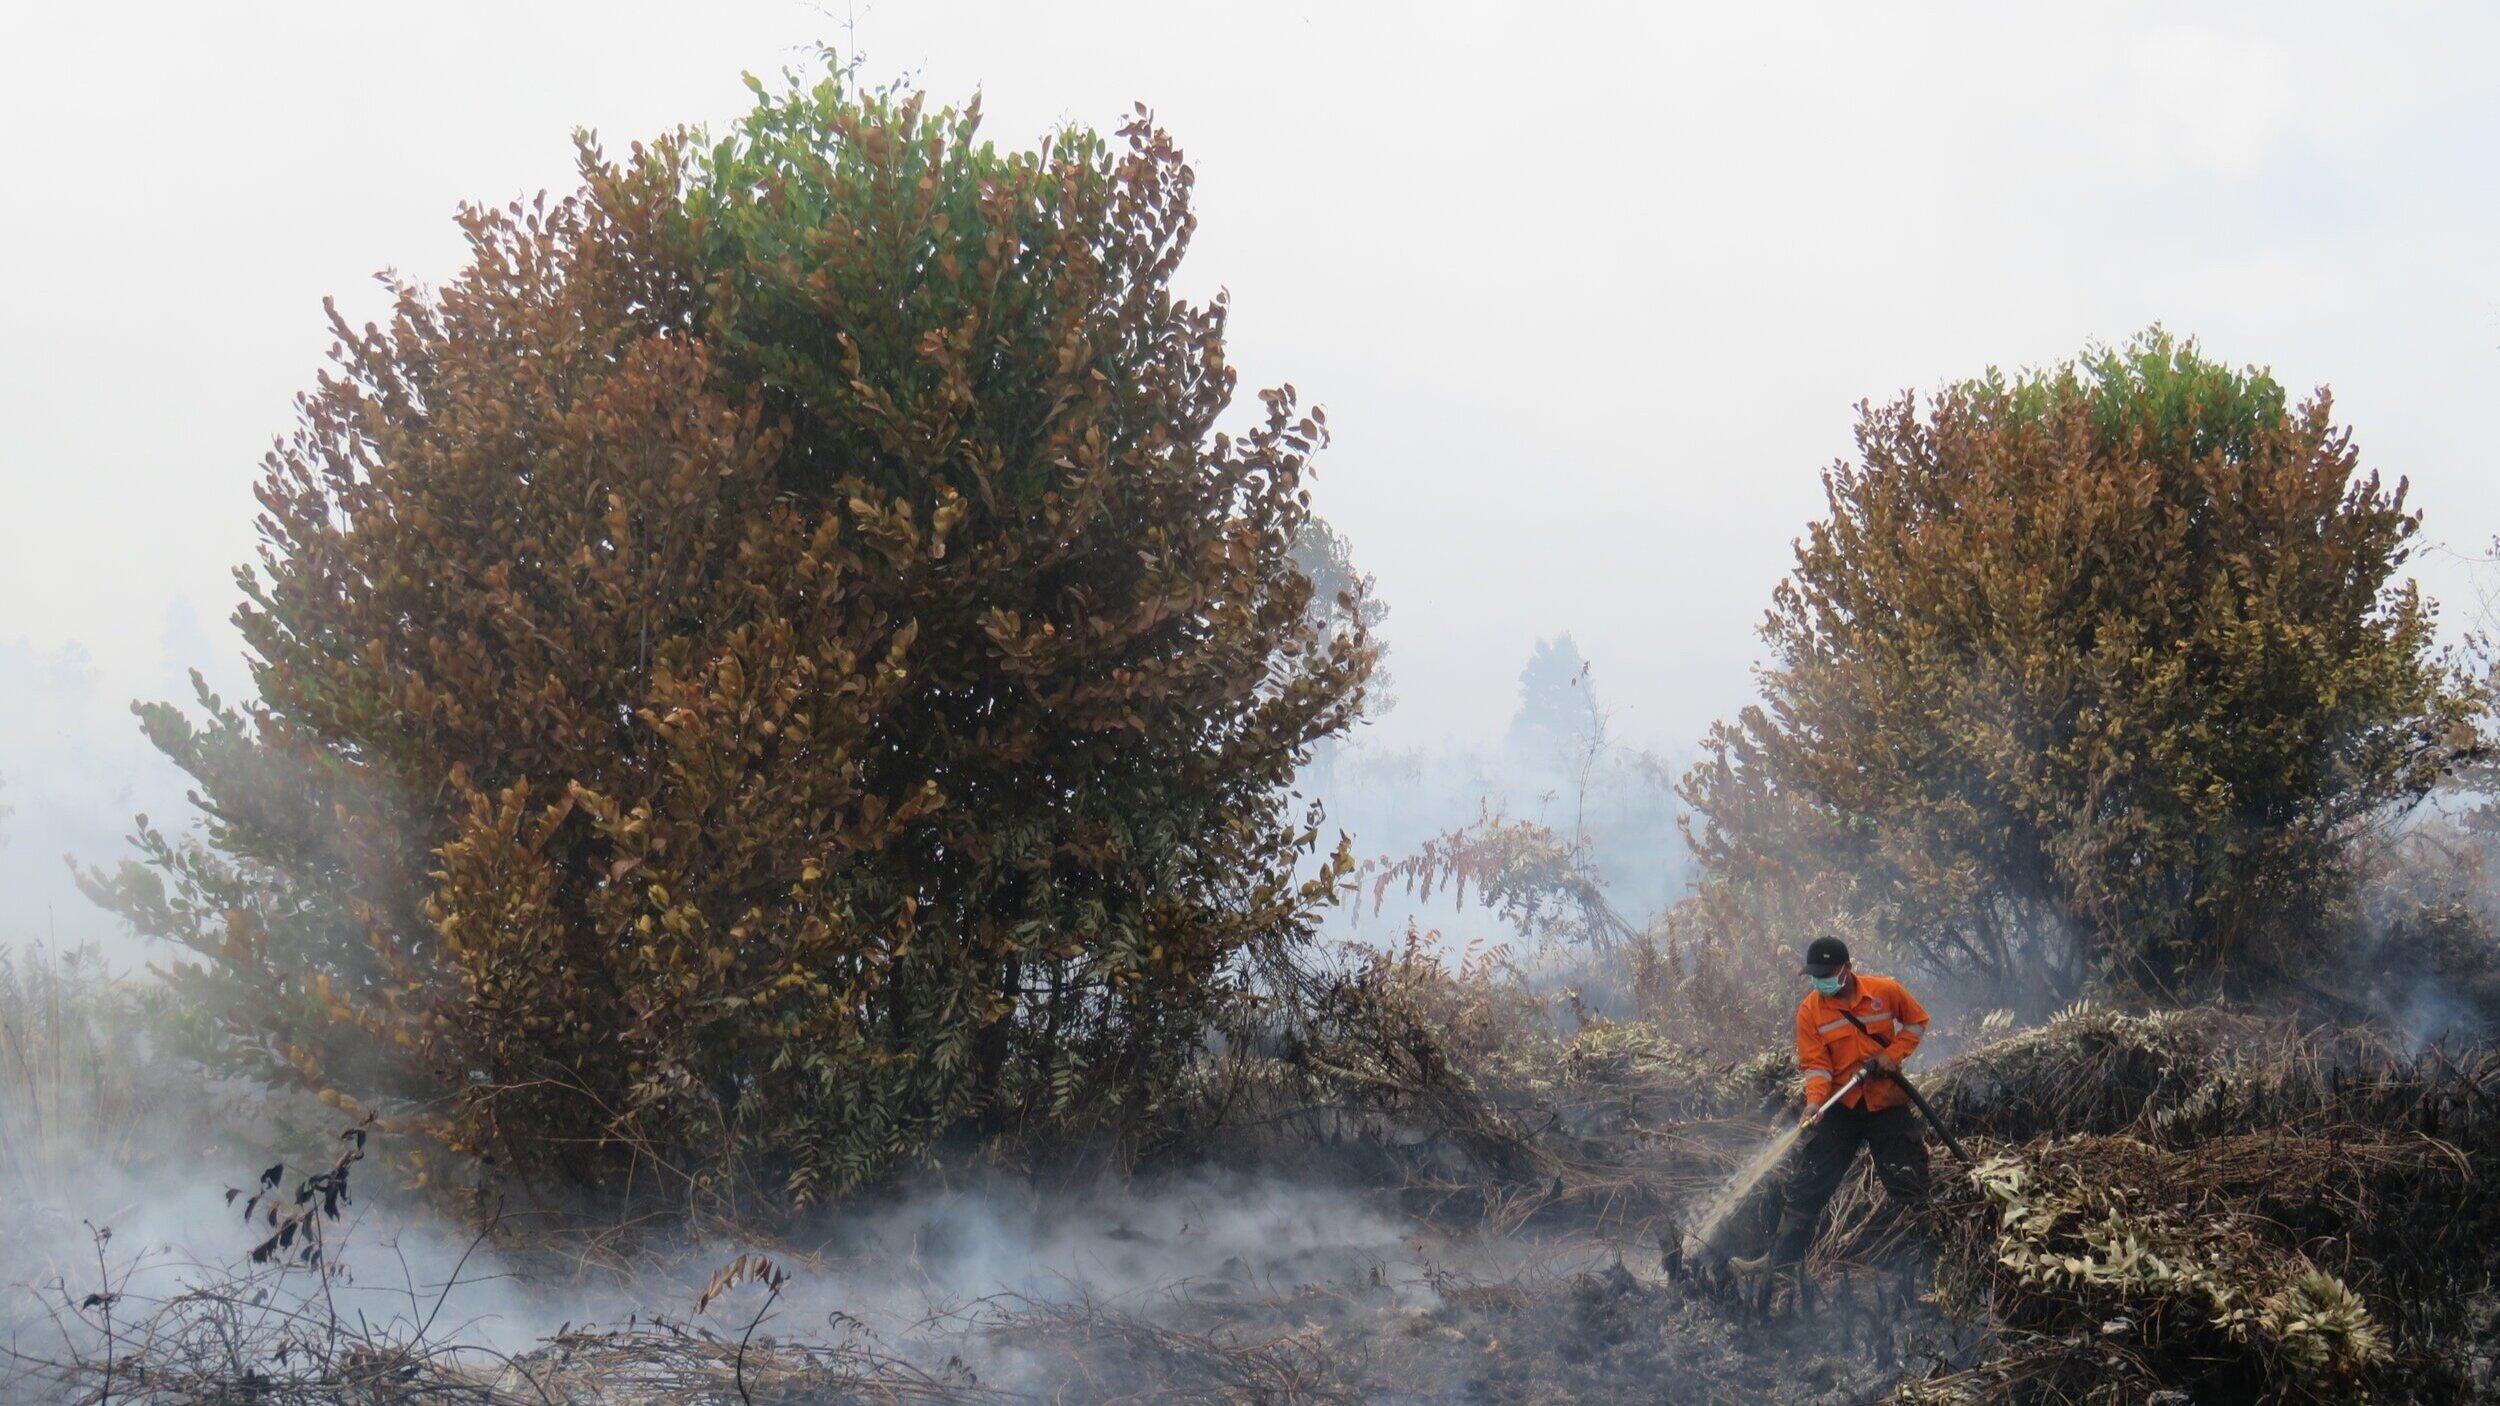 Firefighter extinguishing fire in peatland (Pulang Pisau Regency, Central Kalimantan) }  RANU WELUM MEDIA